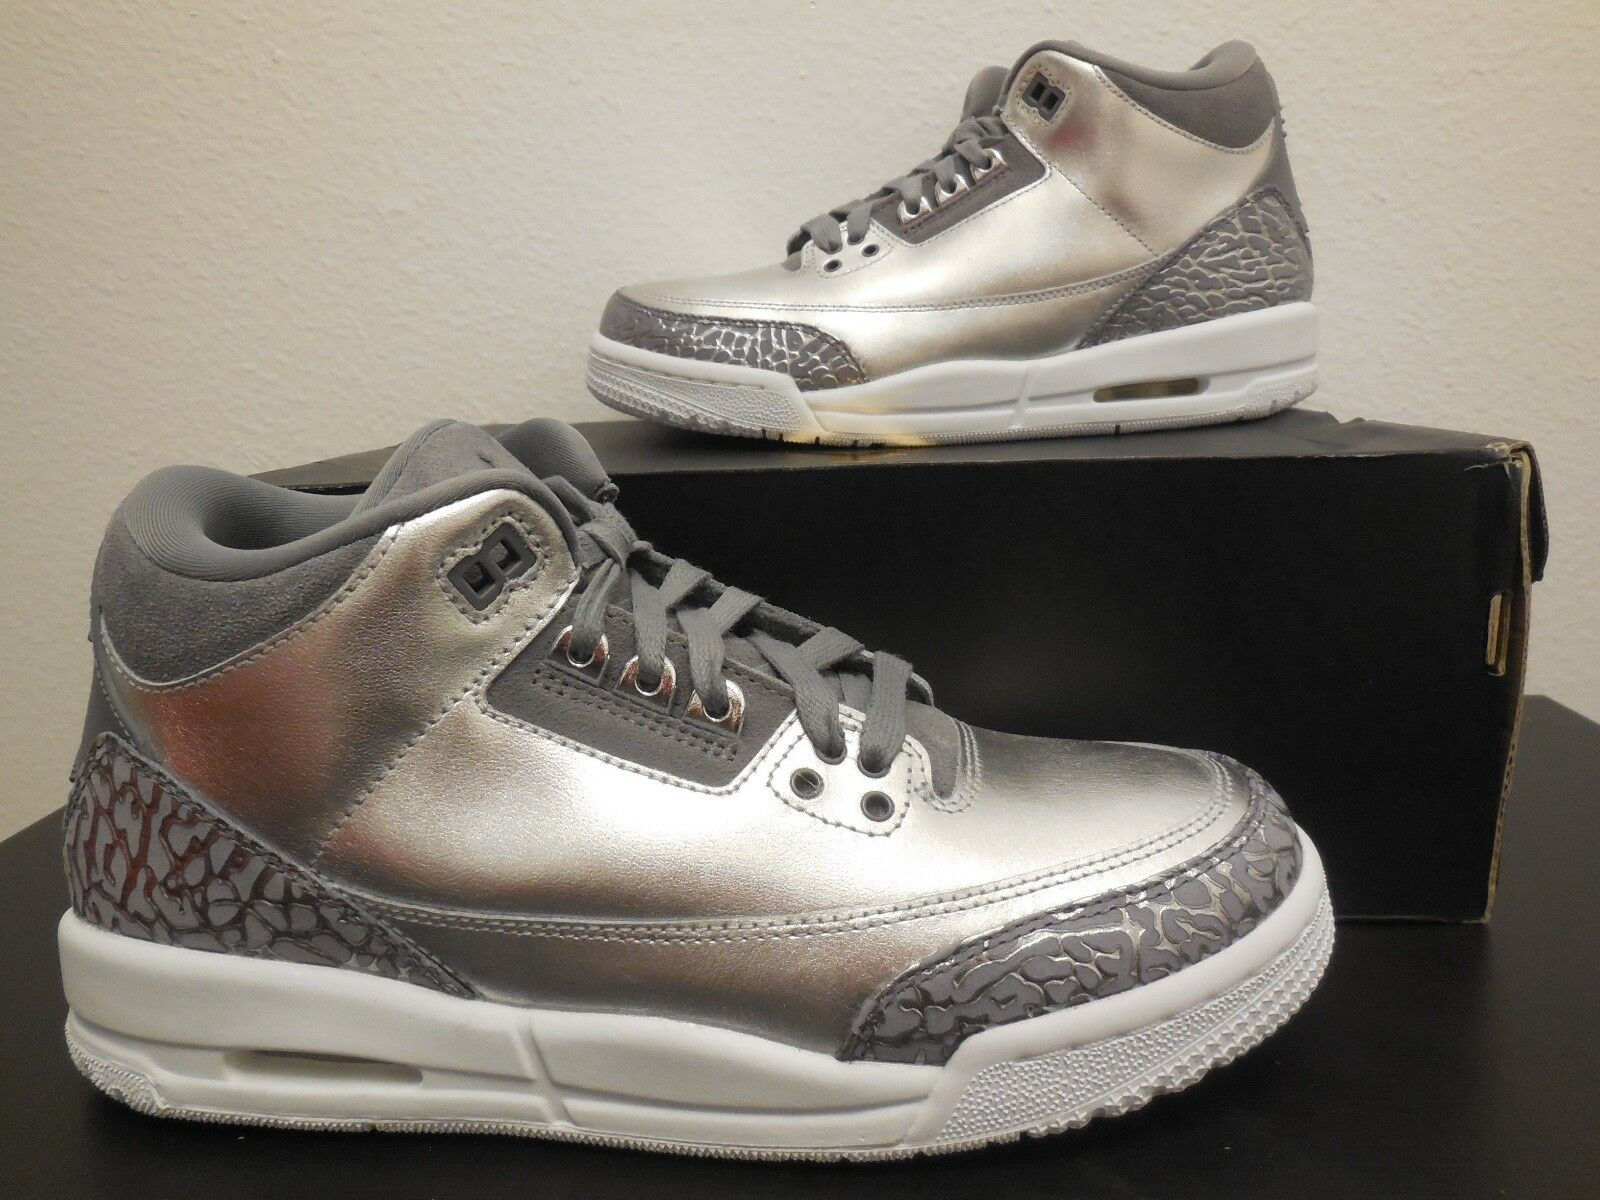 Air Jordan 3 Retro Premium HC shoes -Reg - AA1243 020-Sz 7Y Women's 8.5 -NEW